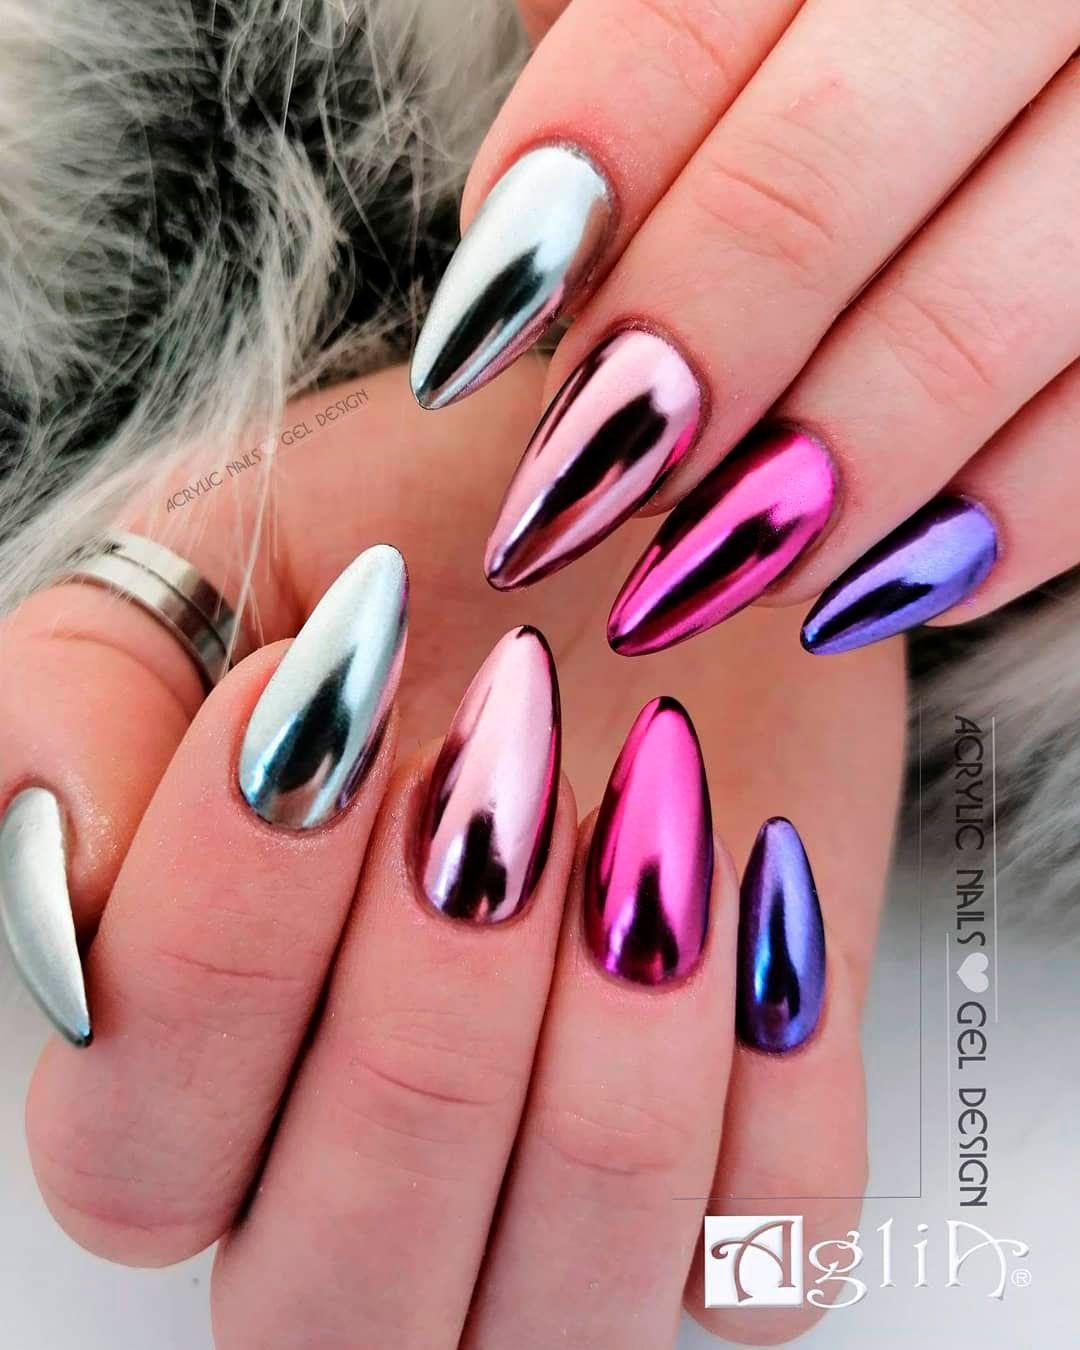 The Best Chrome Nail Ideas to Copy #chromenails